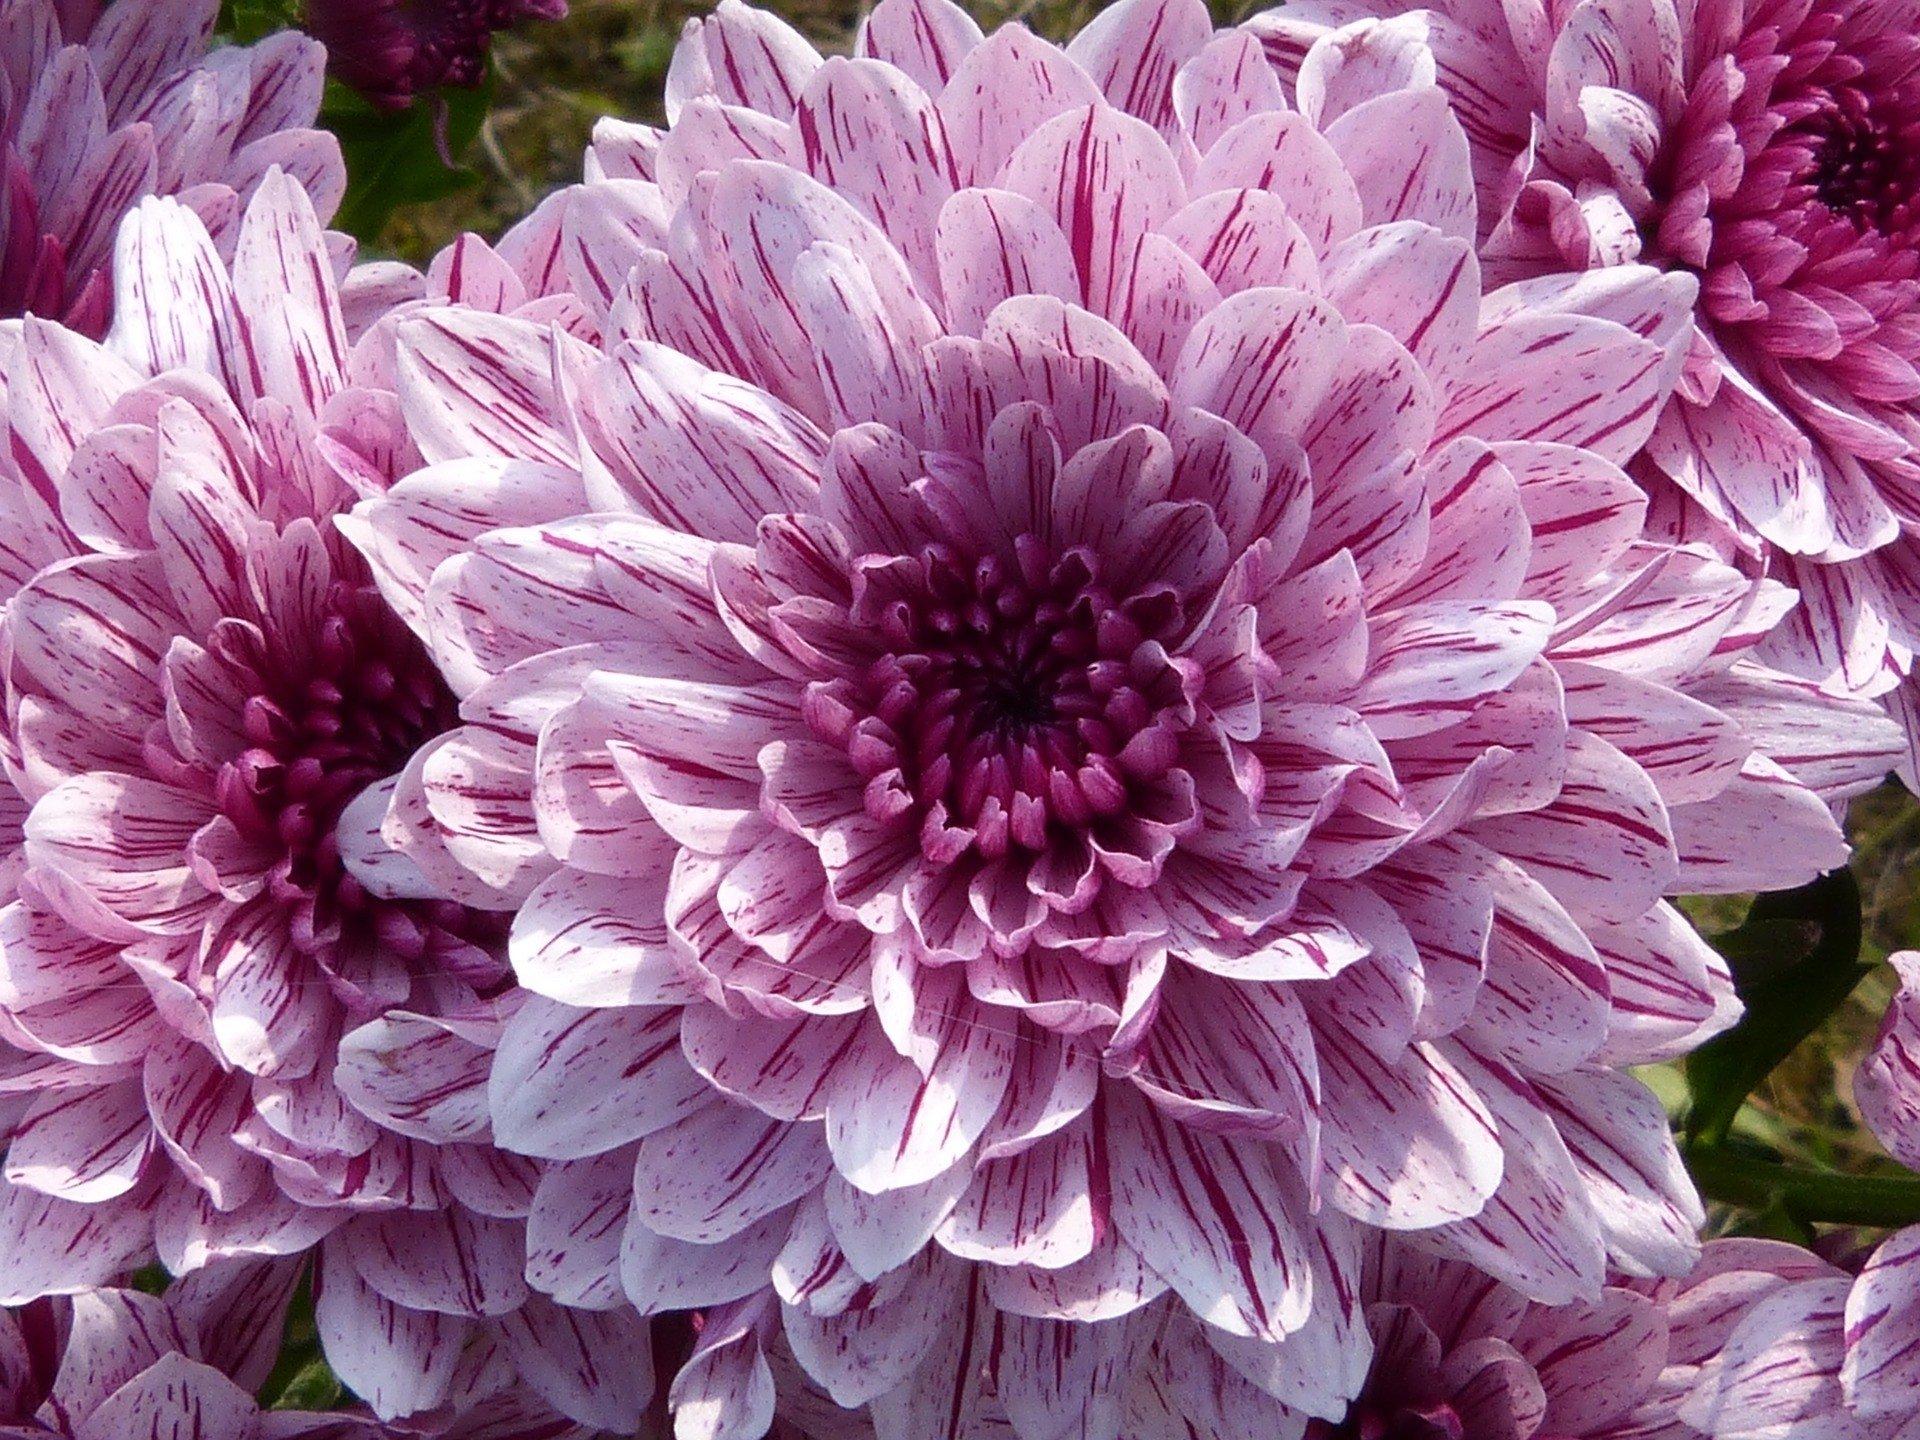 Earth - Dahlia  Earth Flower Close-Up Purple Flower Wallpaper